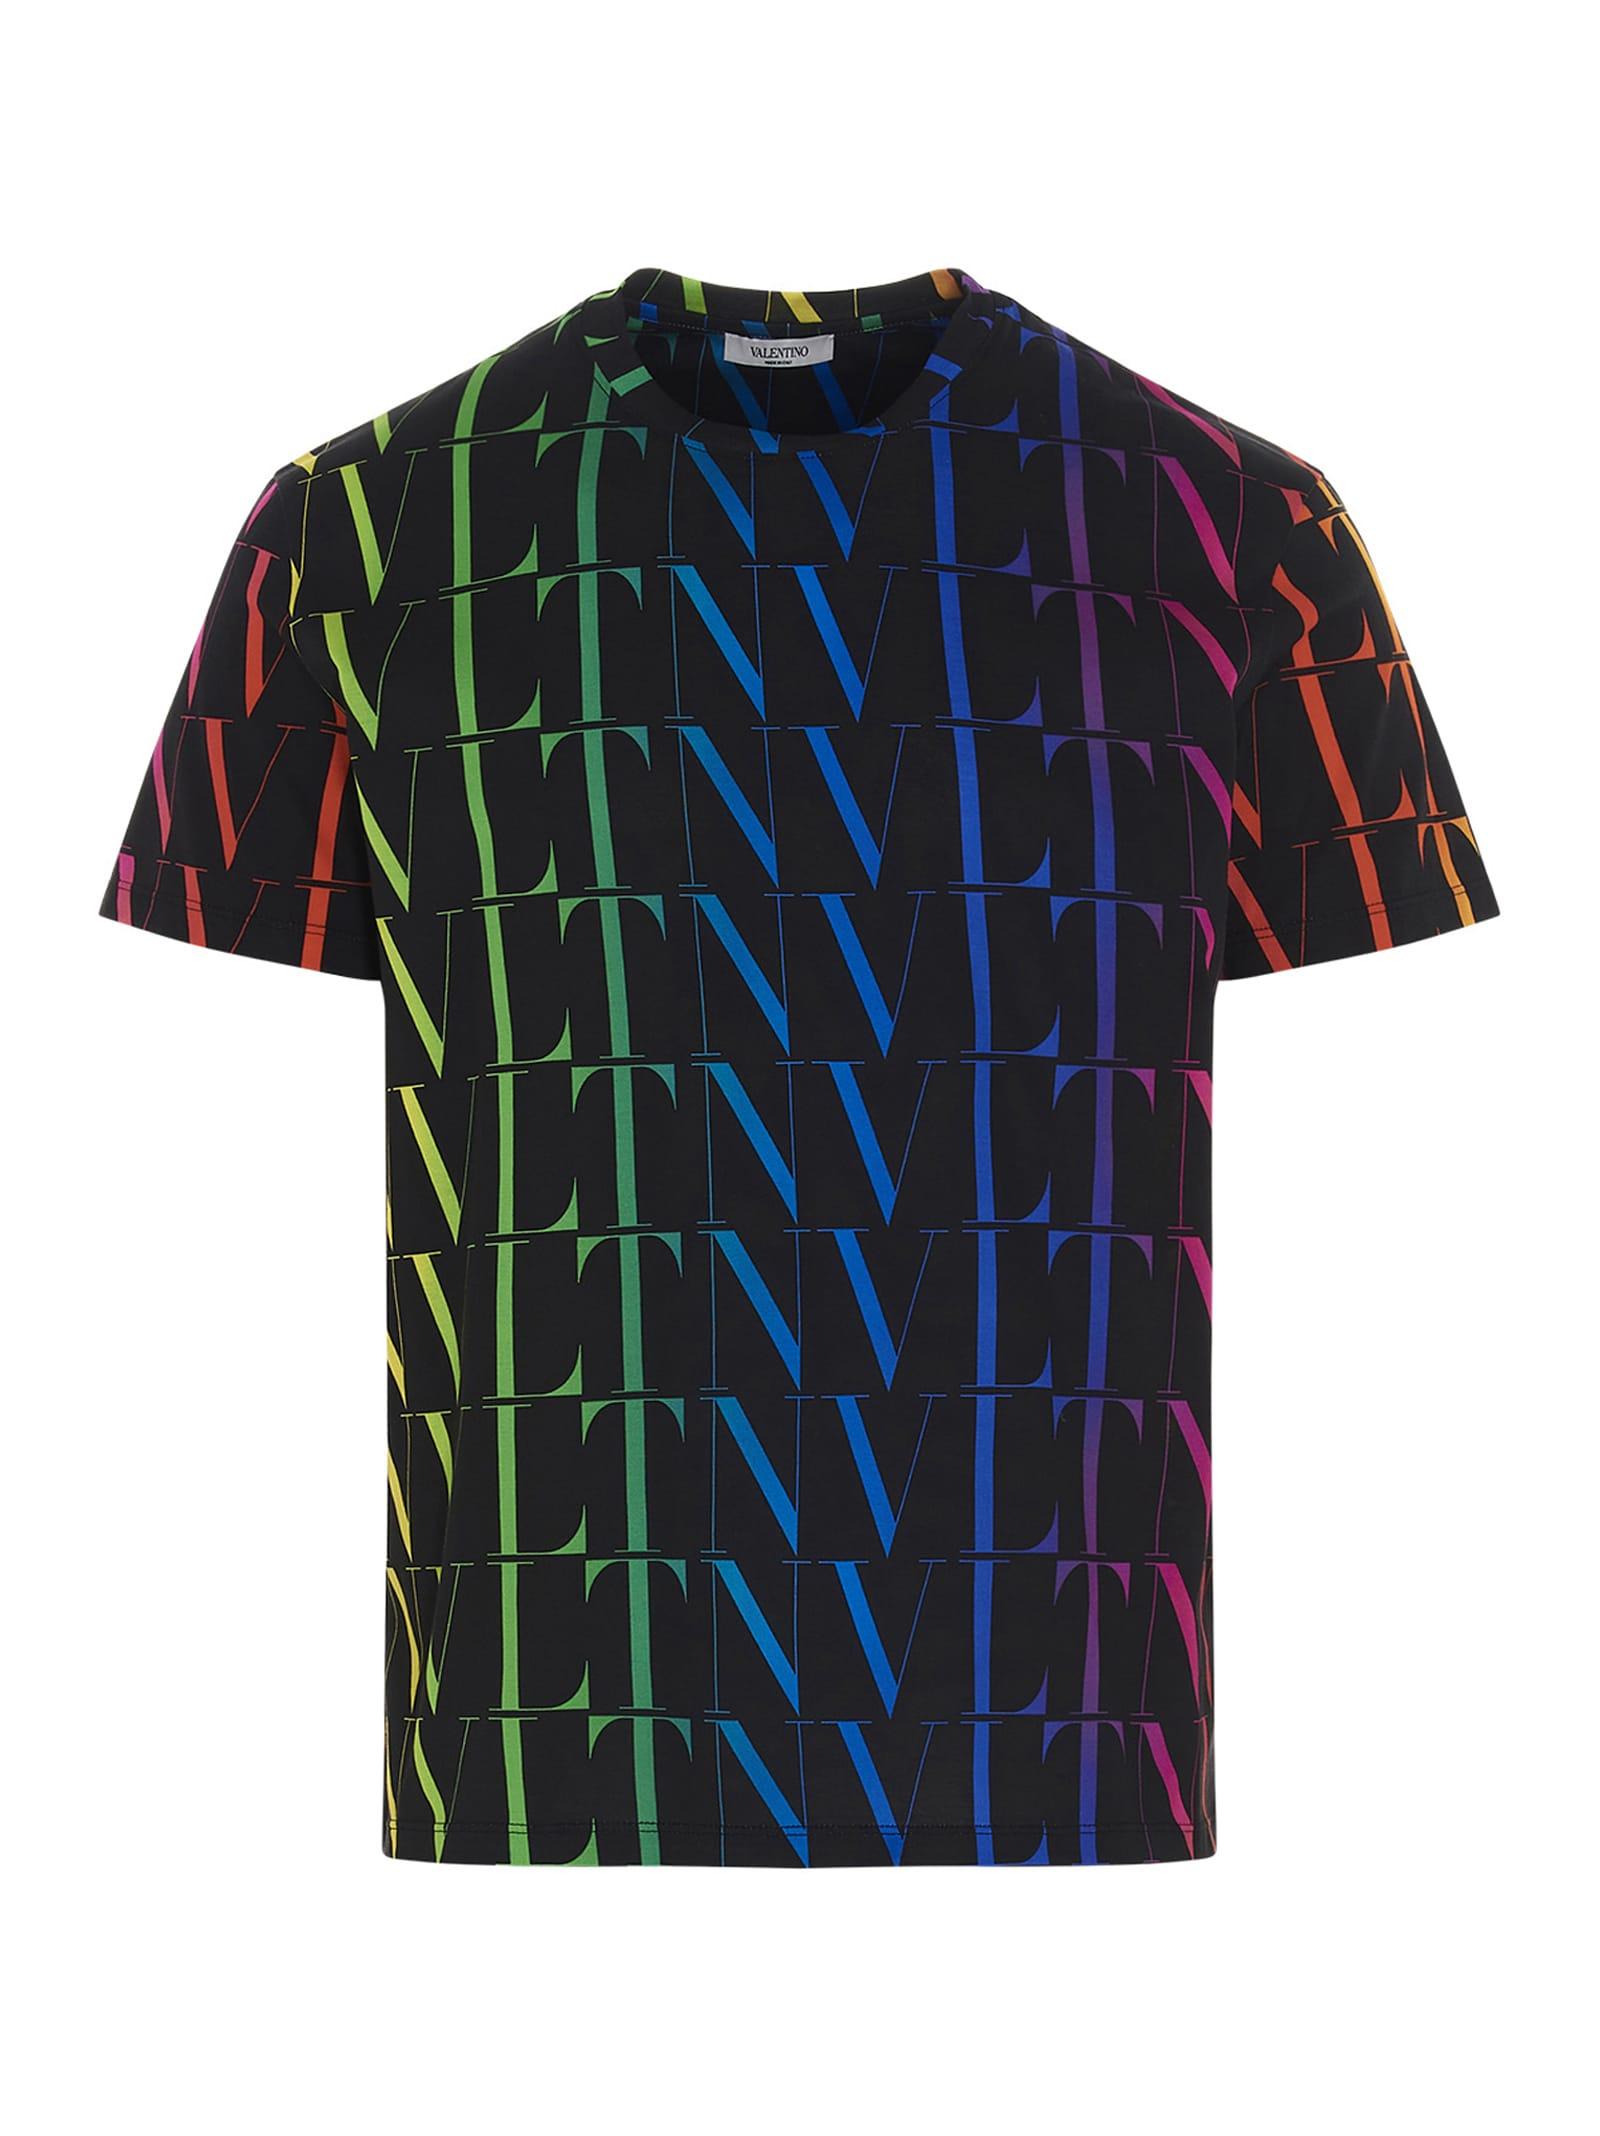 Valentino vltn Times T-shirt